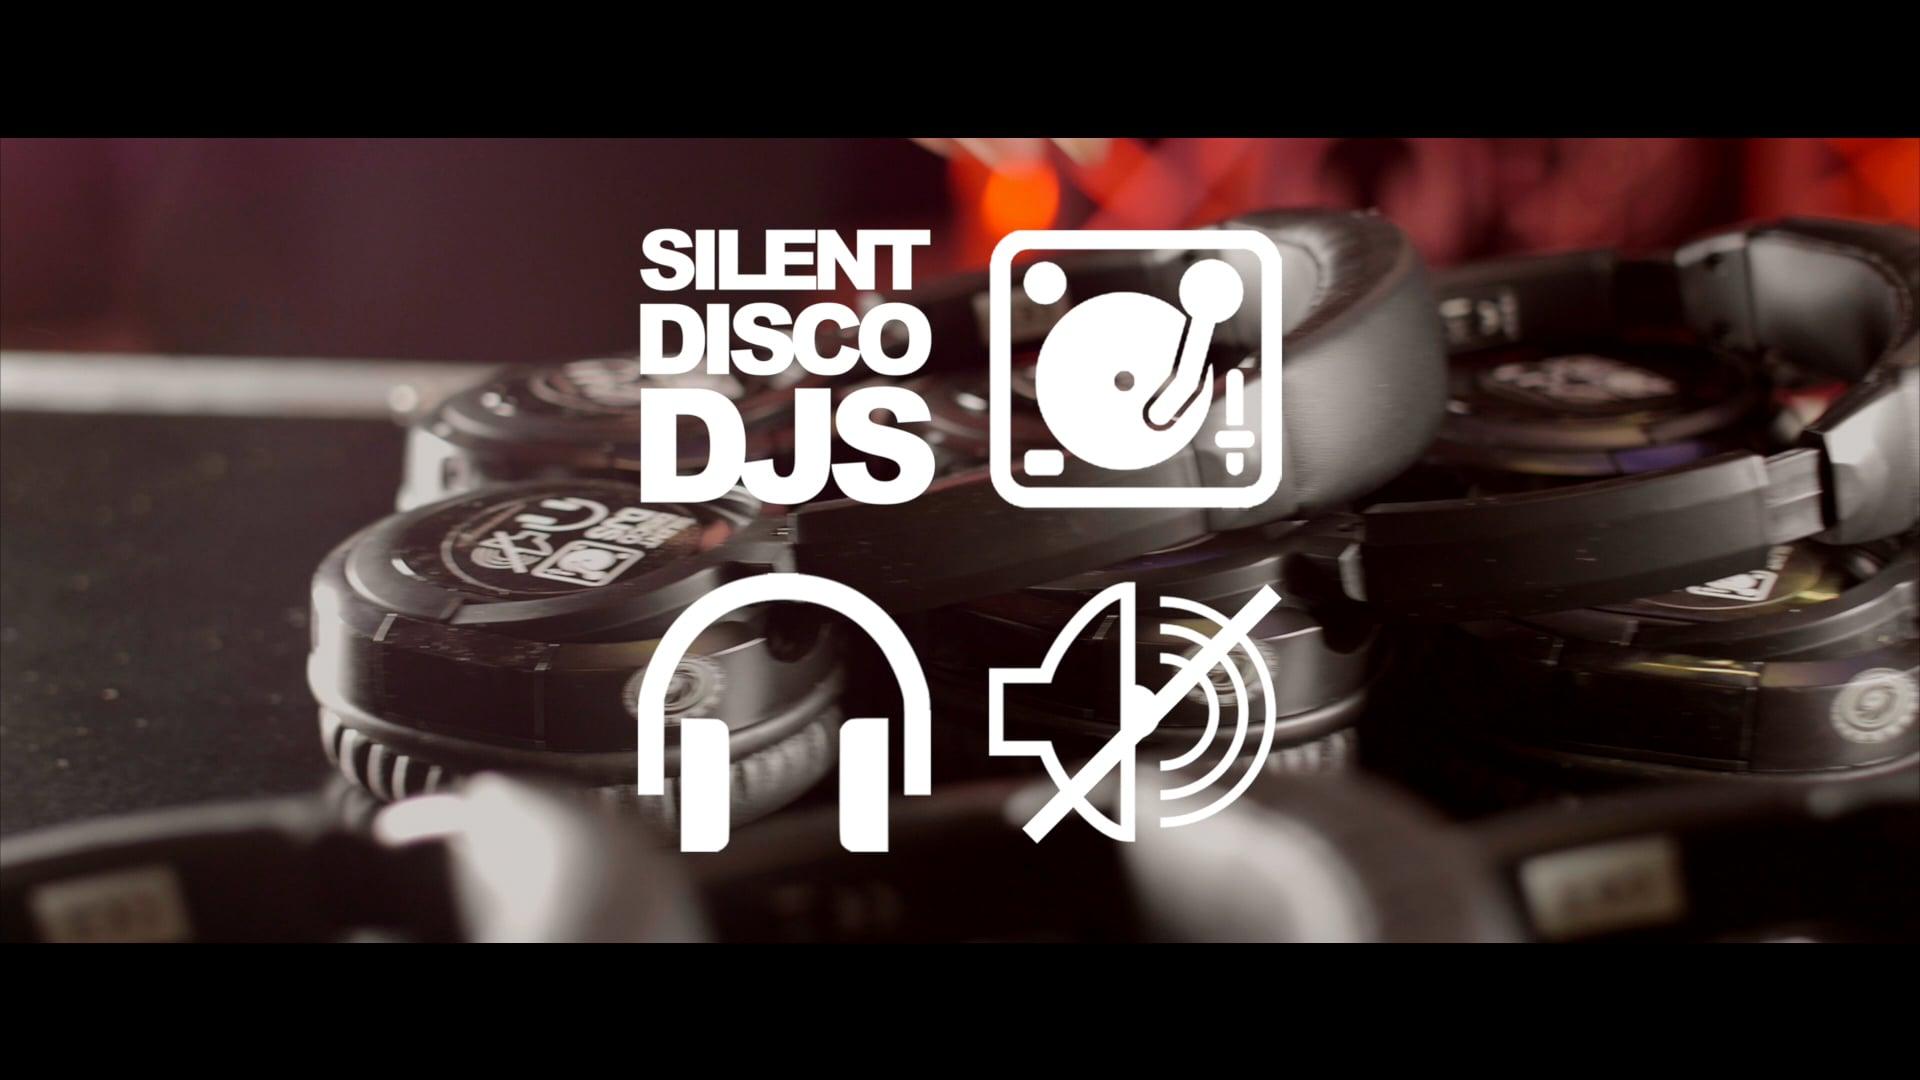 Silent Disco DJ´s